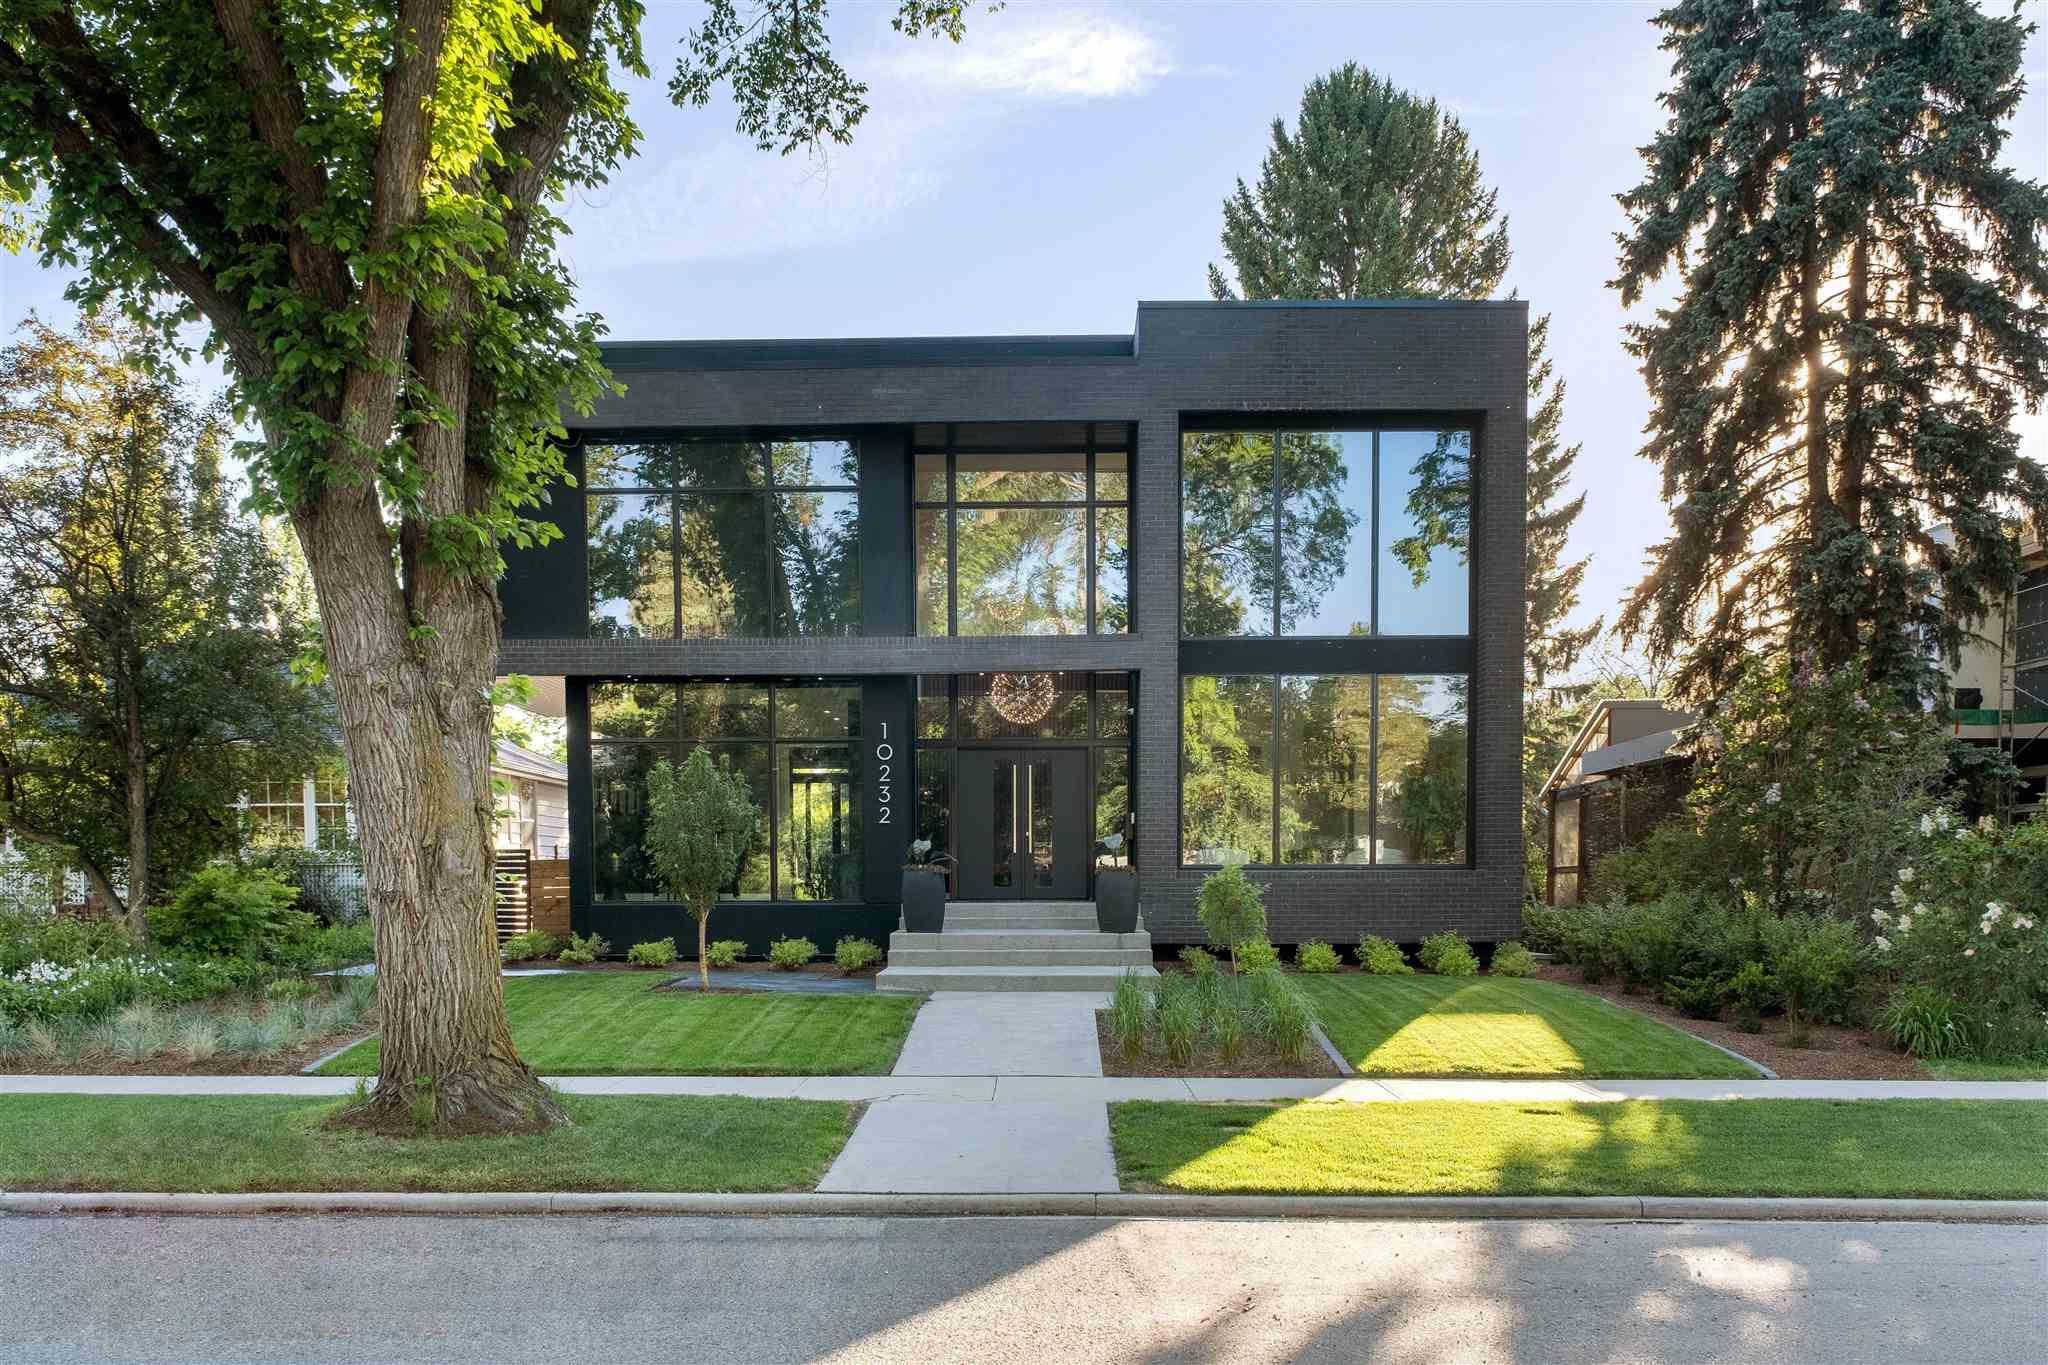 Main Photo: 10232 130 Street in Edmonton: Zone 11 House for sale : MLS®# E4263780